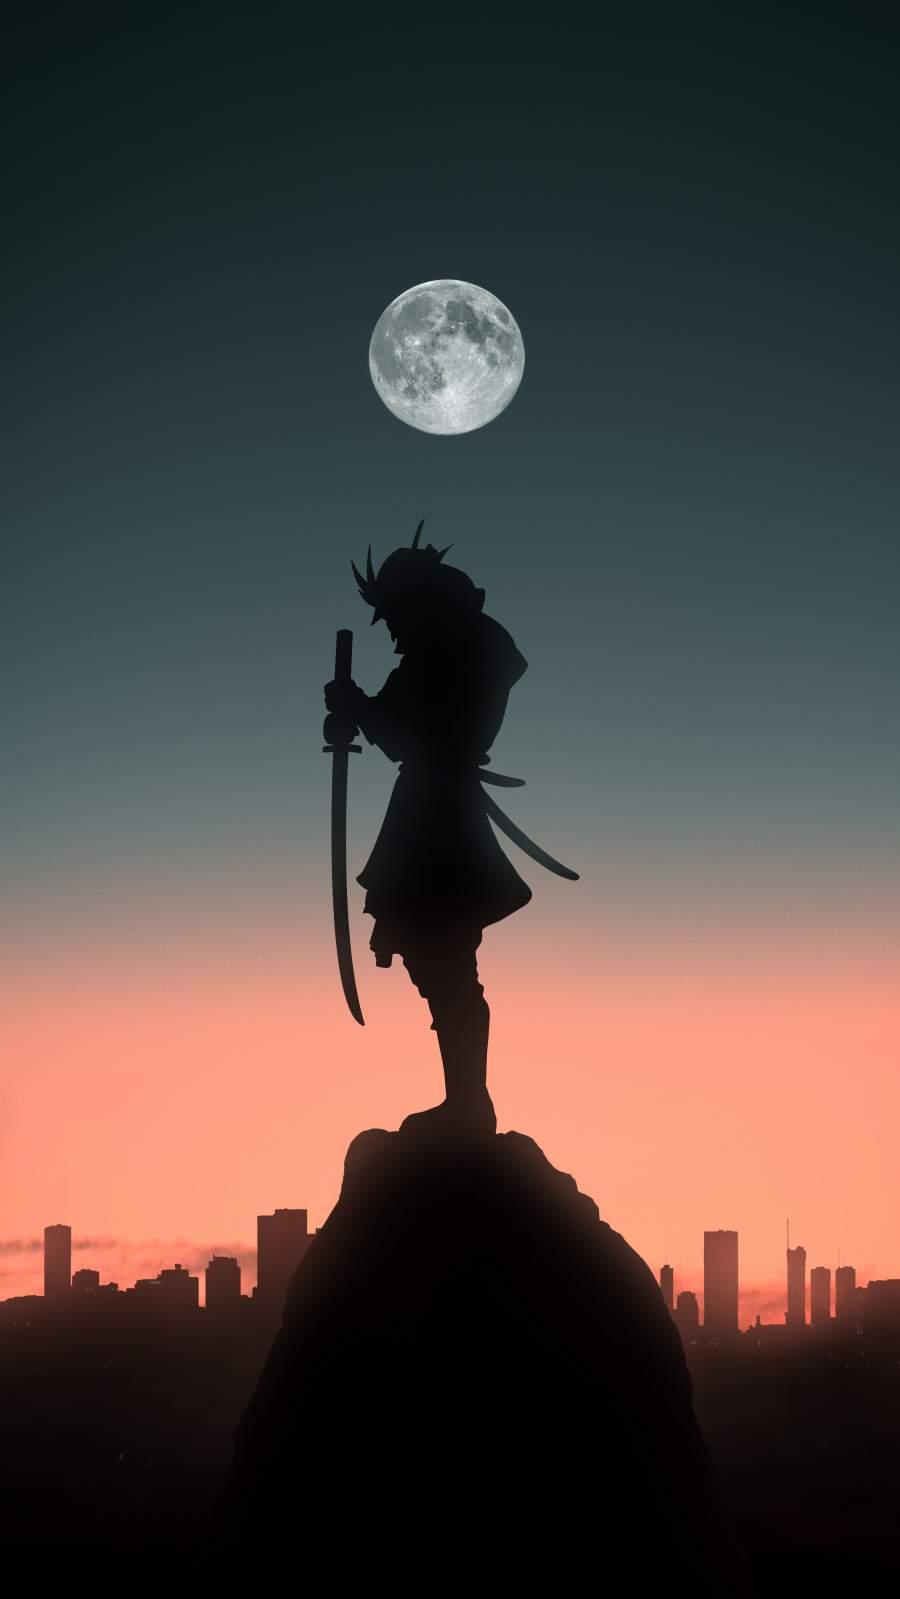 Samurai Silhouette iPhone Wallpaper